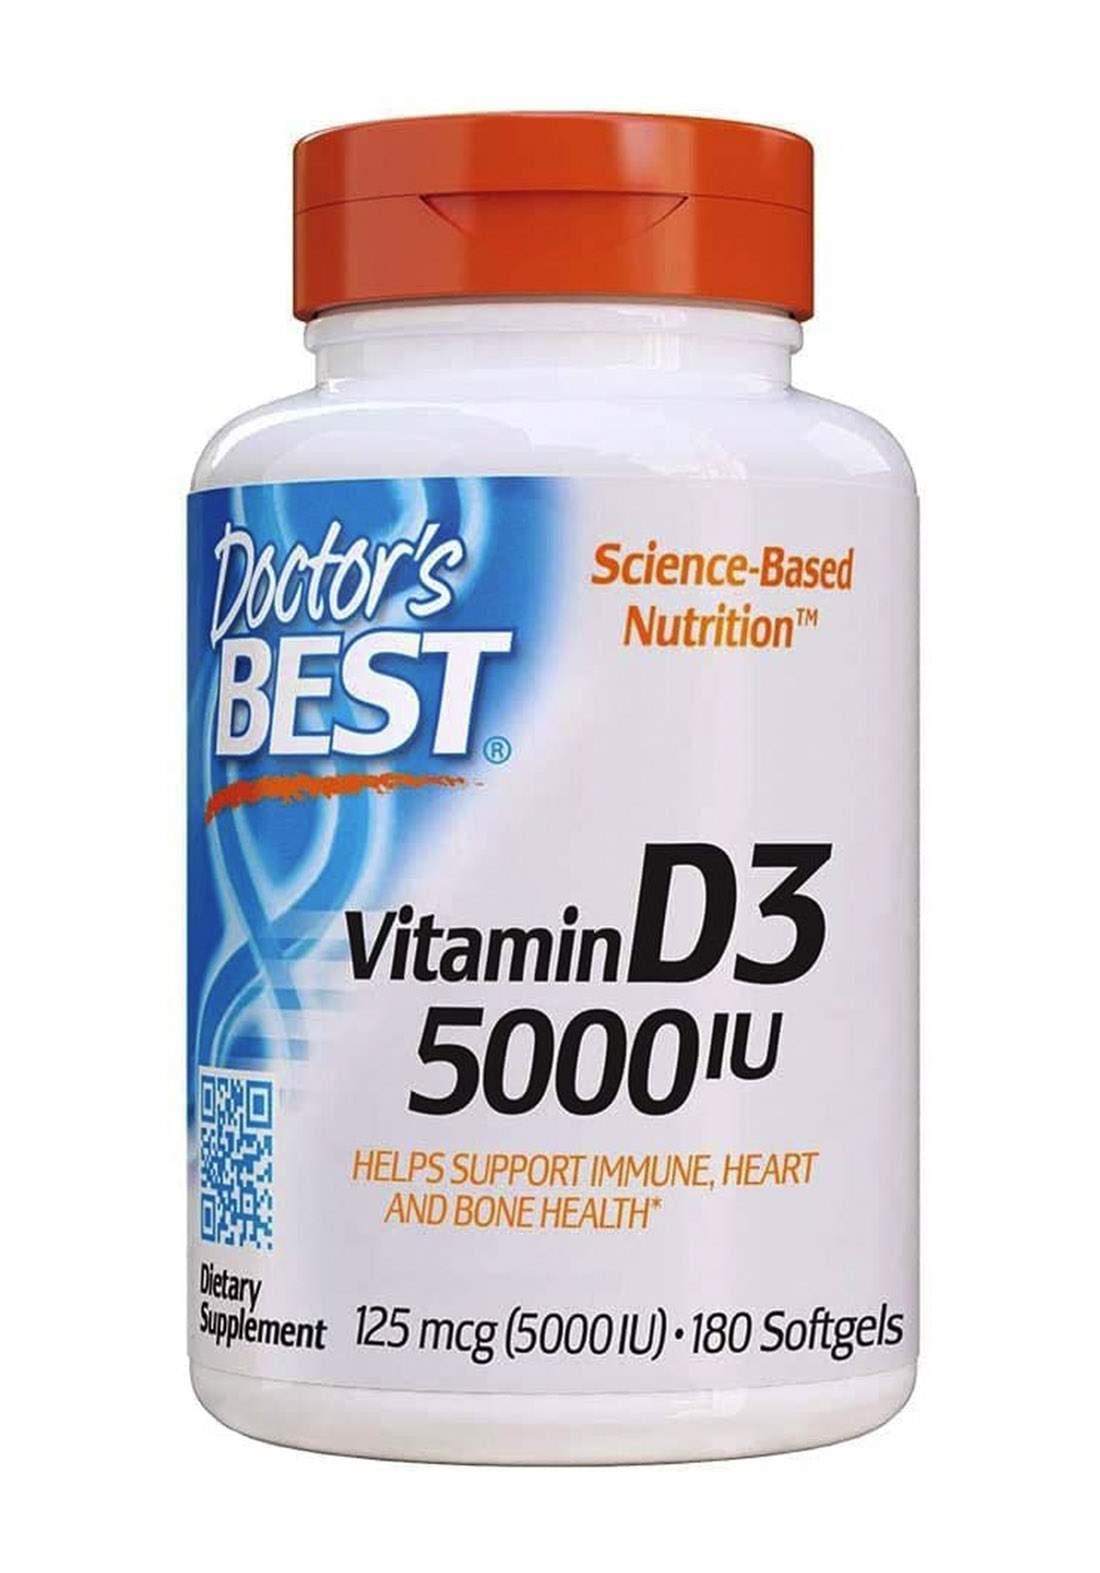 Doctor's Best Vitamin D3 5000IU 180 Capsules فيتامينات